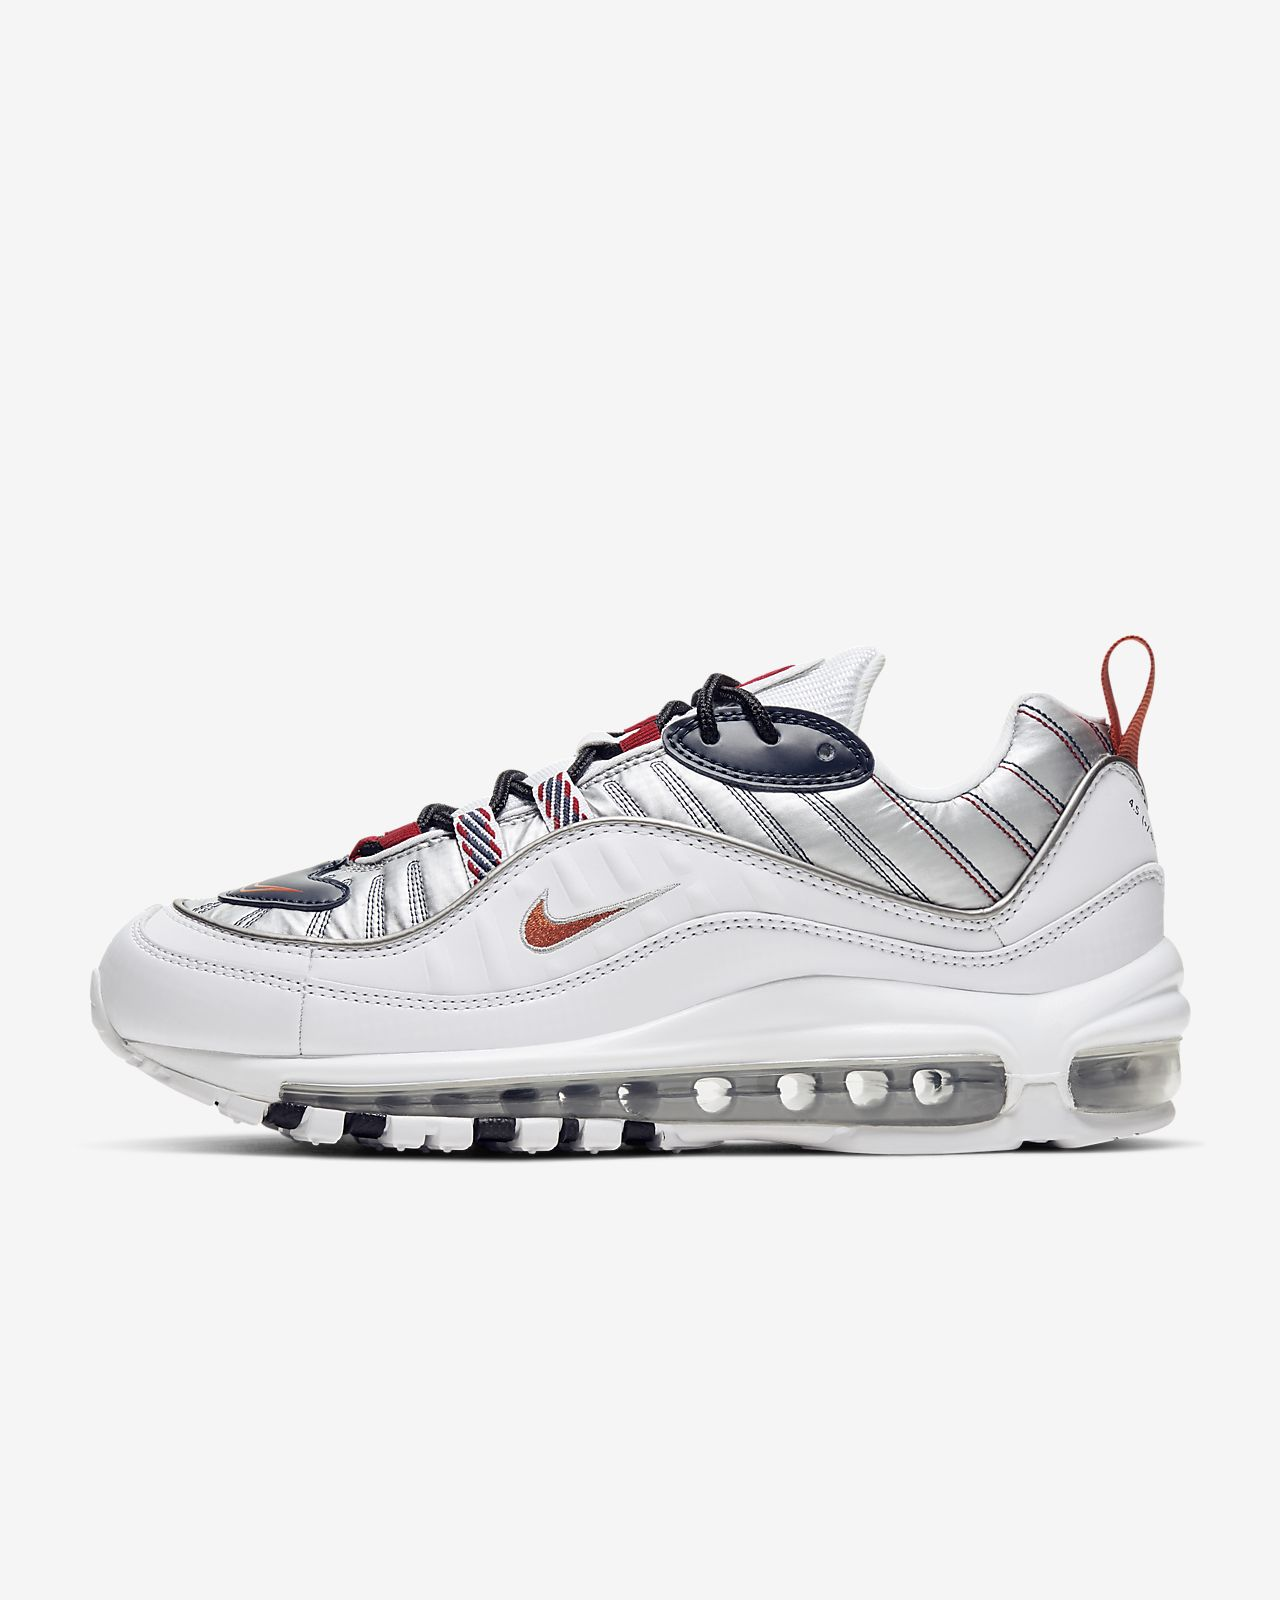 Nike Air Max 98 PRM 女子运动鞋